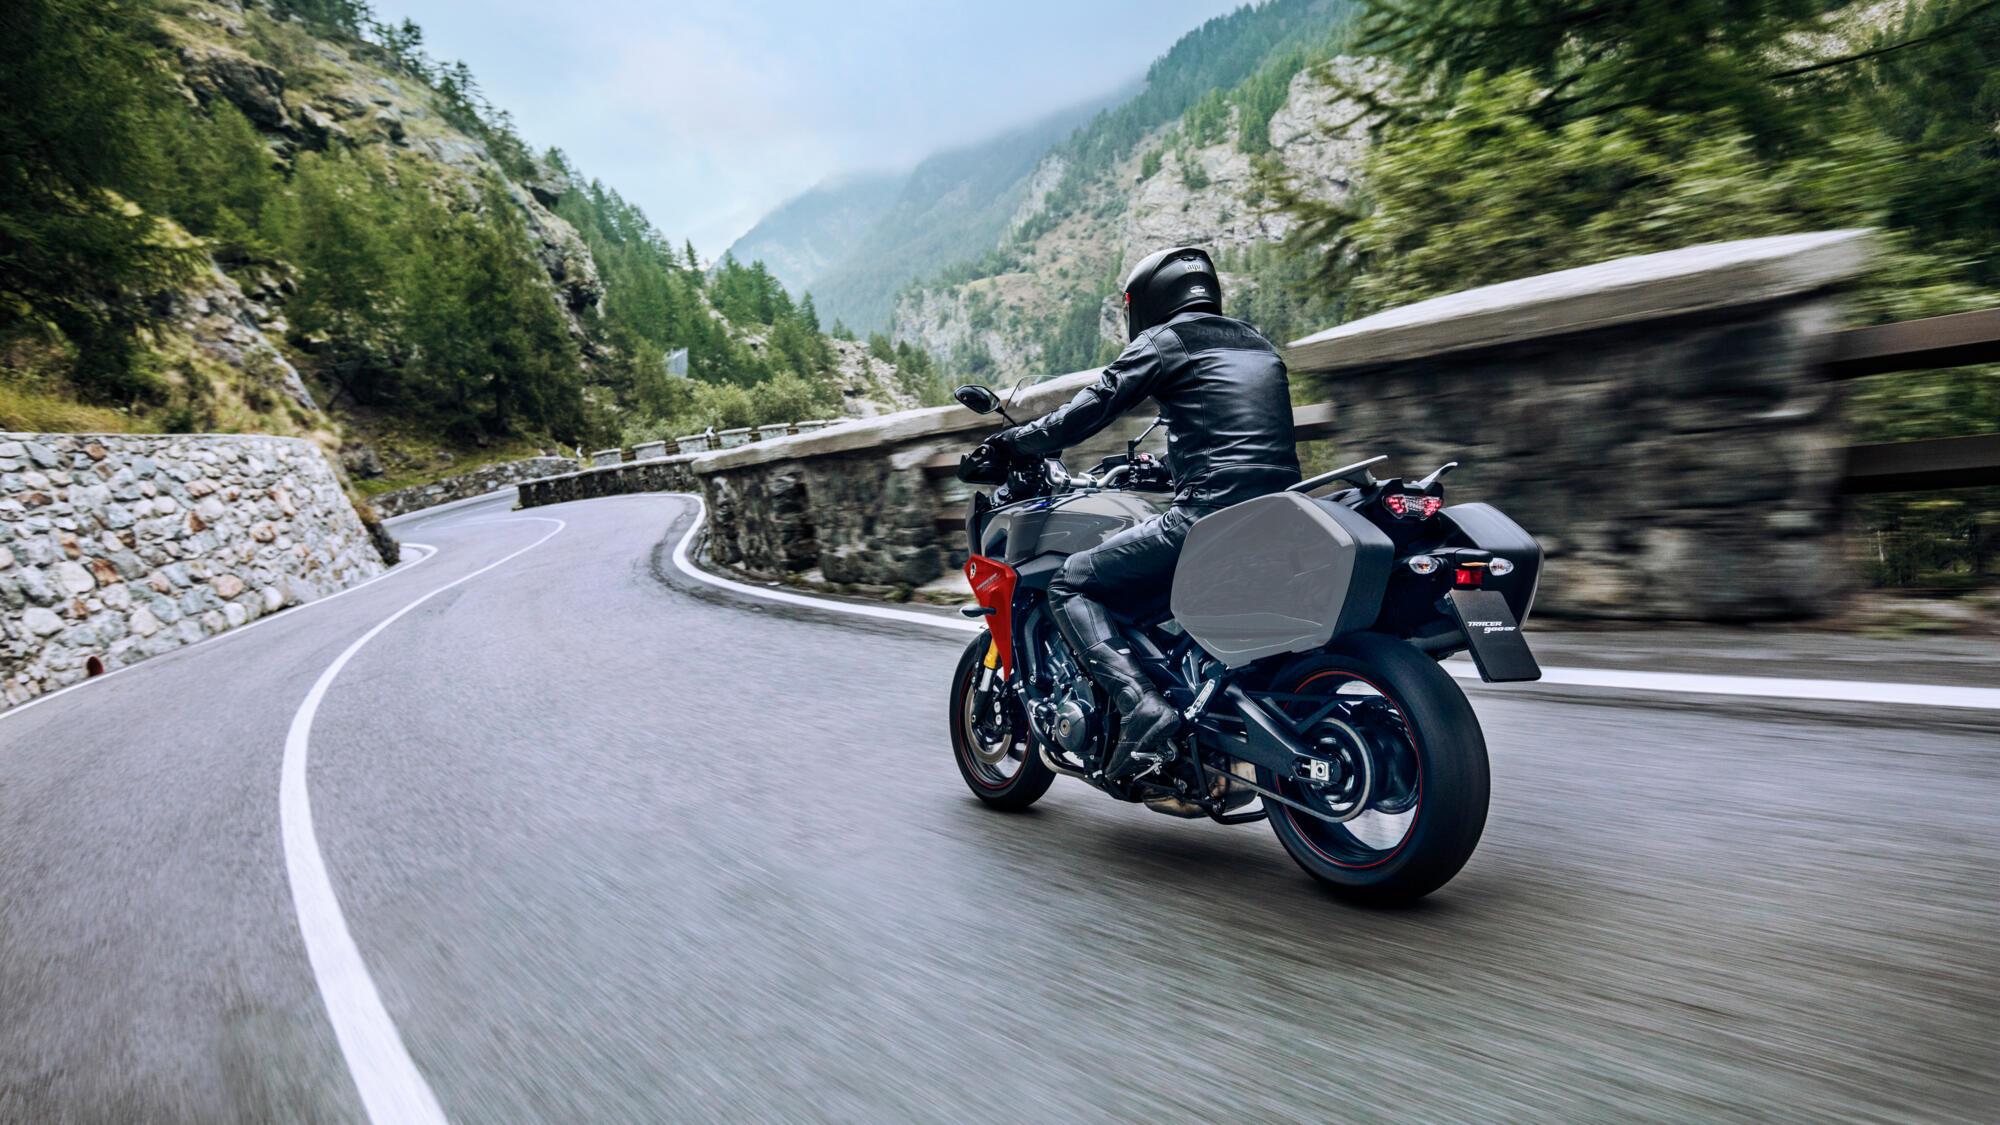 New 2019 Yamaha Tracer 900 GT Motorcycles in Allen, TX